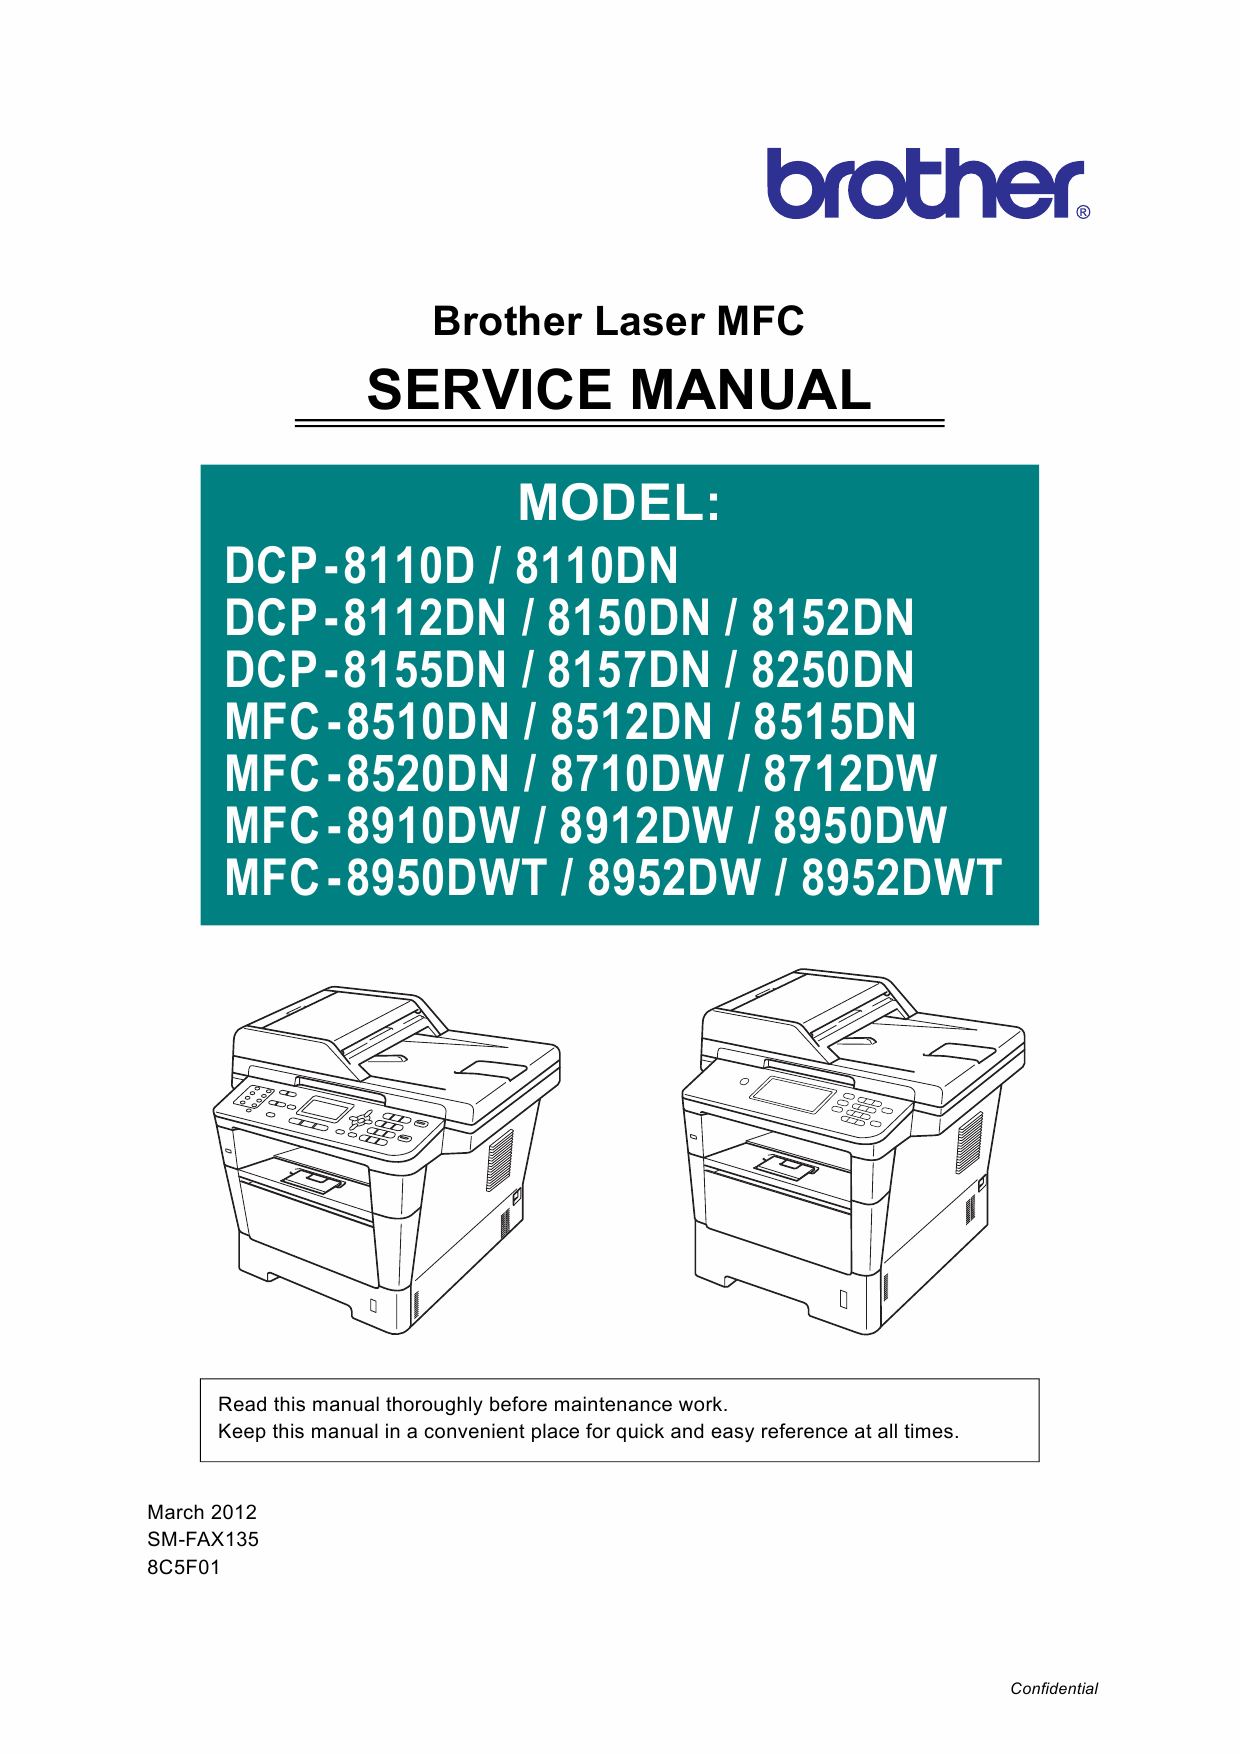 Brother mfc-8520dn service manual онлайн [20/373].